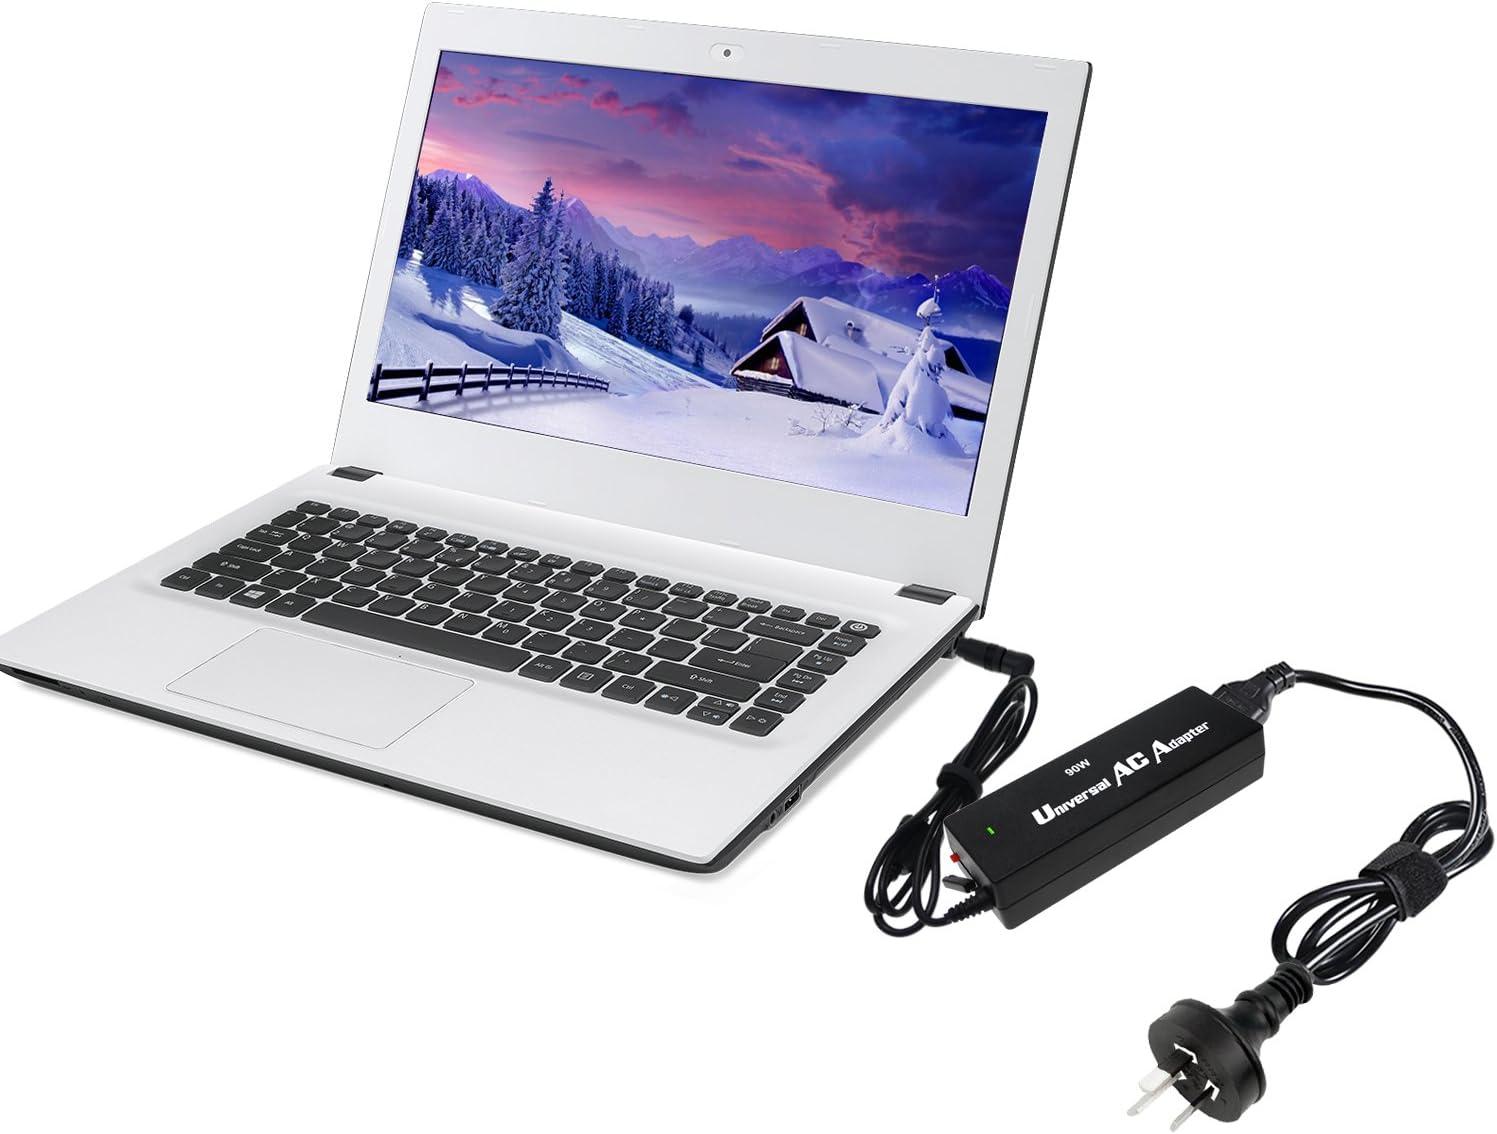 Notebook Laptop Caricabatterie Alimentatore 19v 4.74a 90w per Acer Aspire 1350